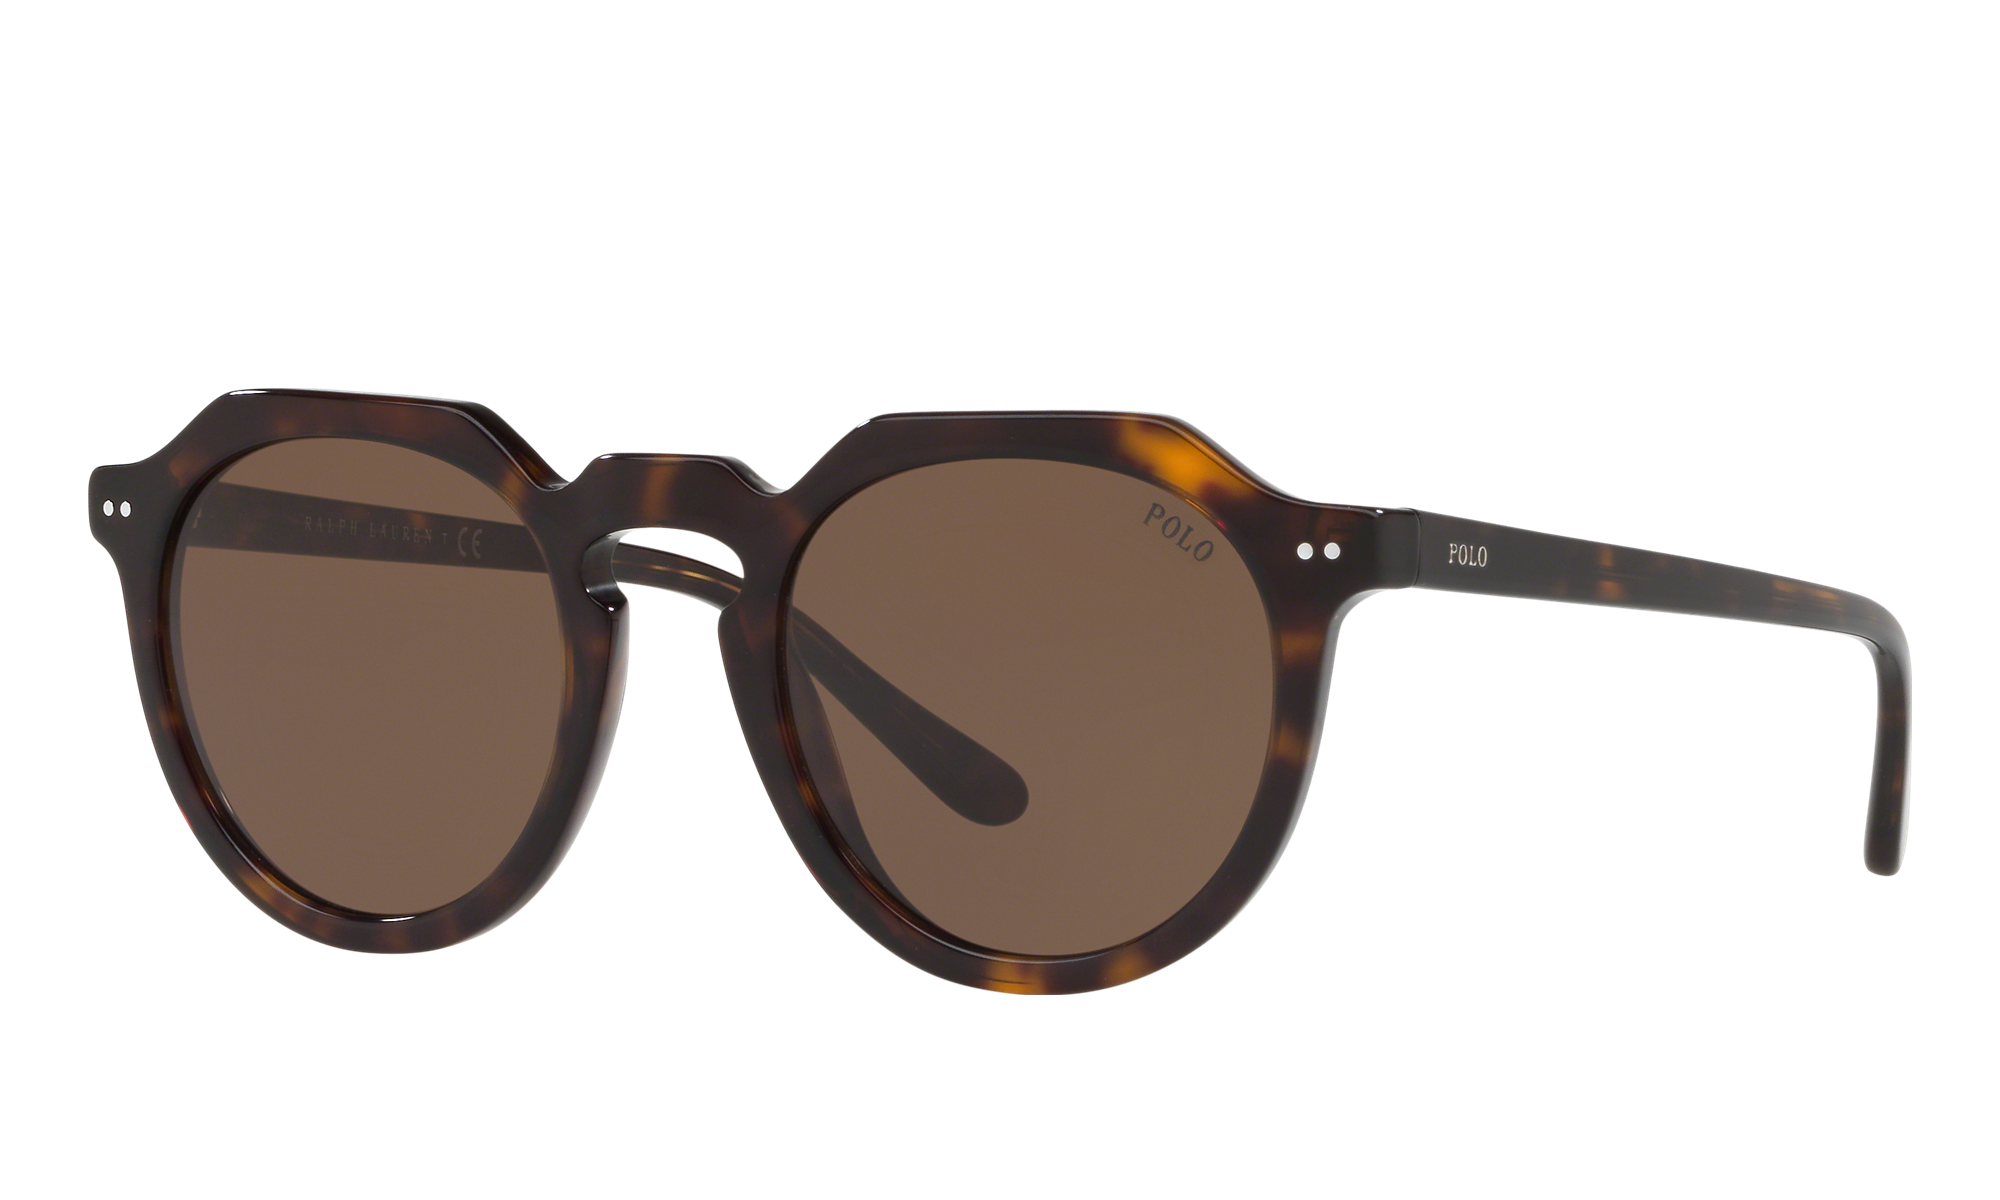 Retro Sunglasses | Vintage Glasses | New Vintage Eyeglasses Polo Ralph Lauren Unisex Ph4138 Tortoise Size Standard $79.00 AT vintagedancer.com